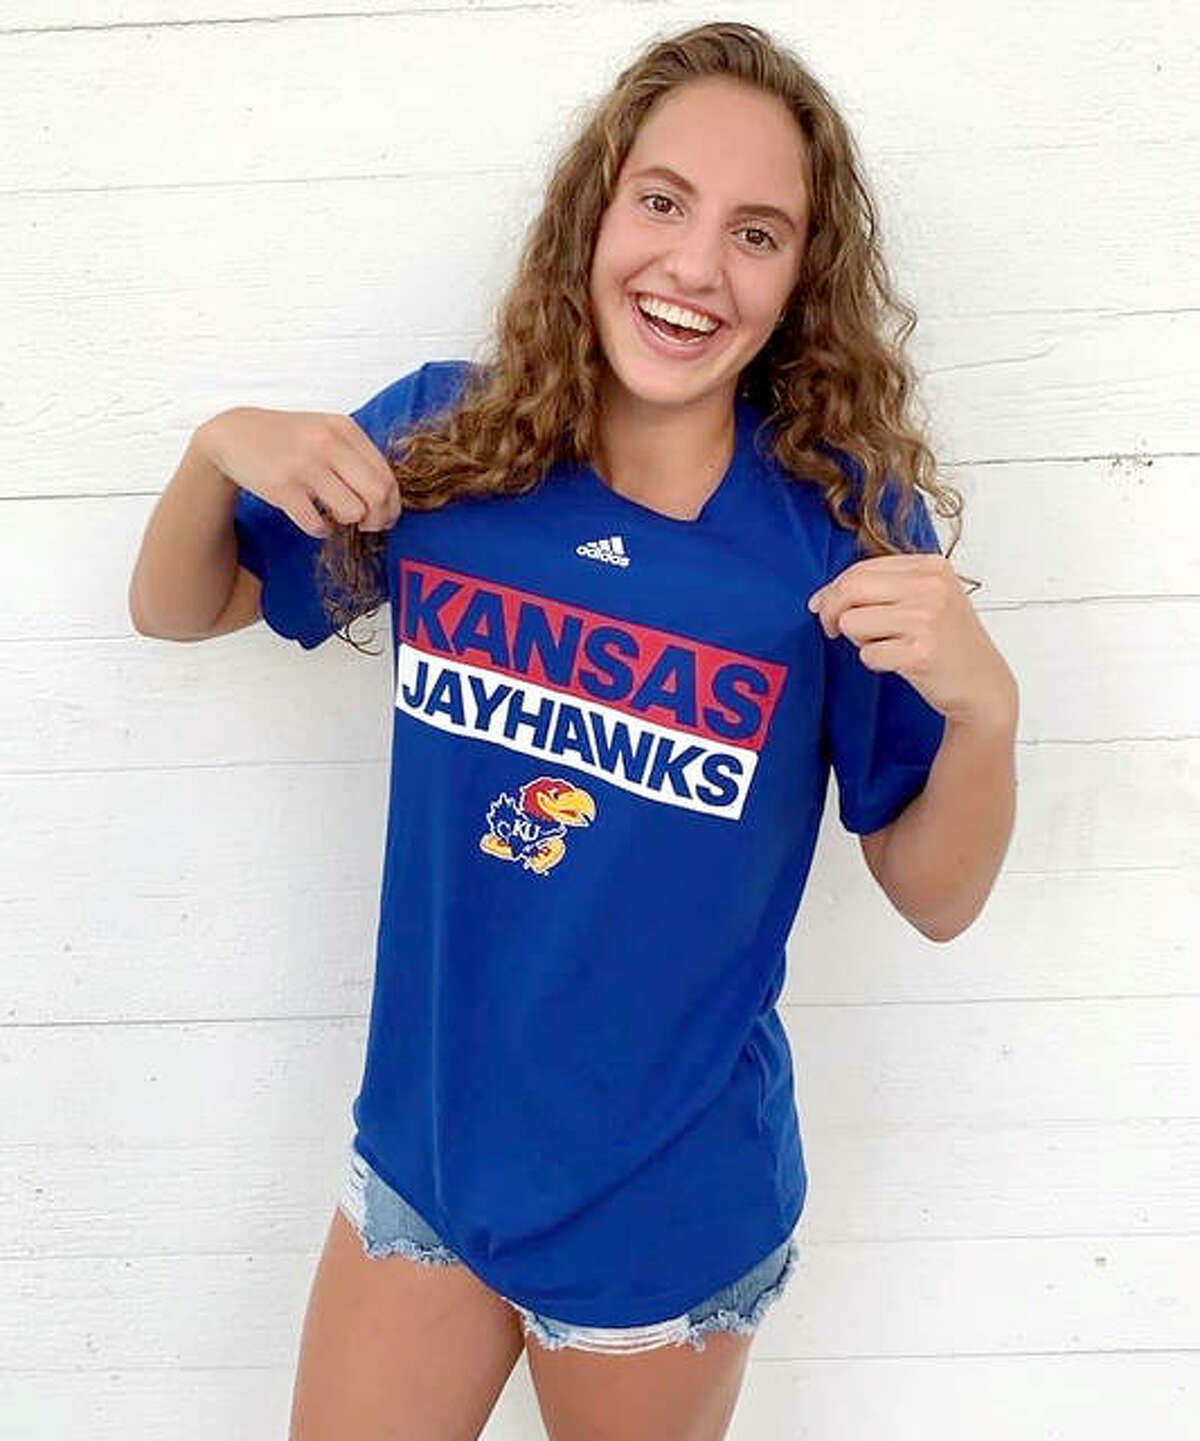 Eleni Kotzamanis, a senior at Alton High, has made a verbal commitment to swim at the University of Kansas next school year. Kotzamanis swims for the Flyers Aquatic Swim Team of St. Louis.